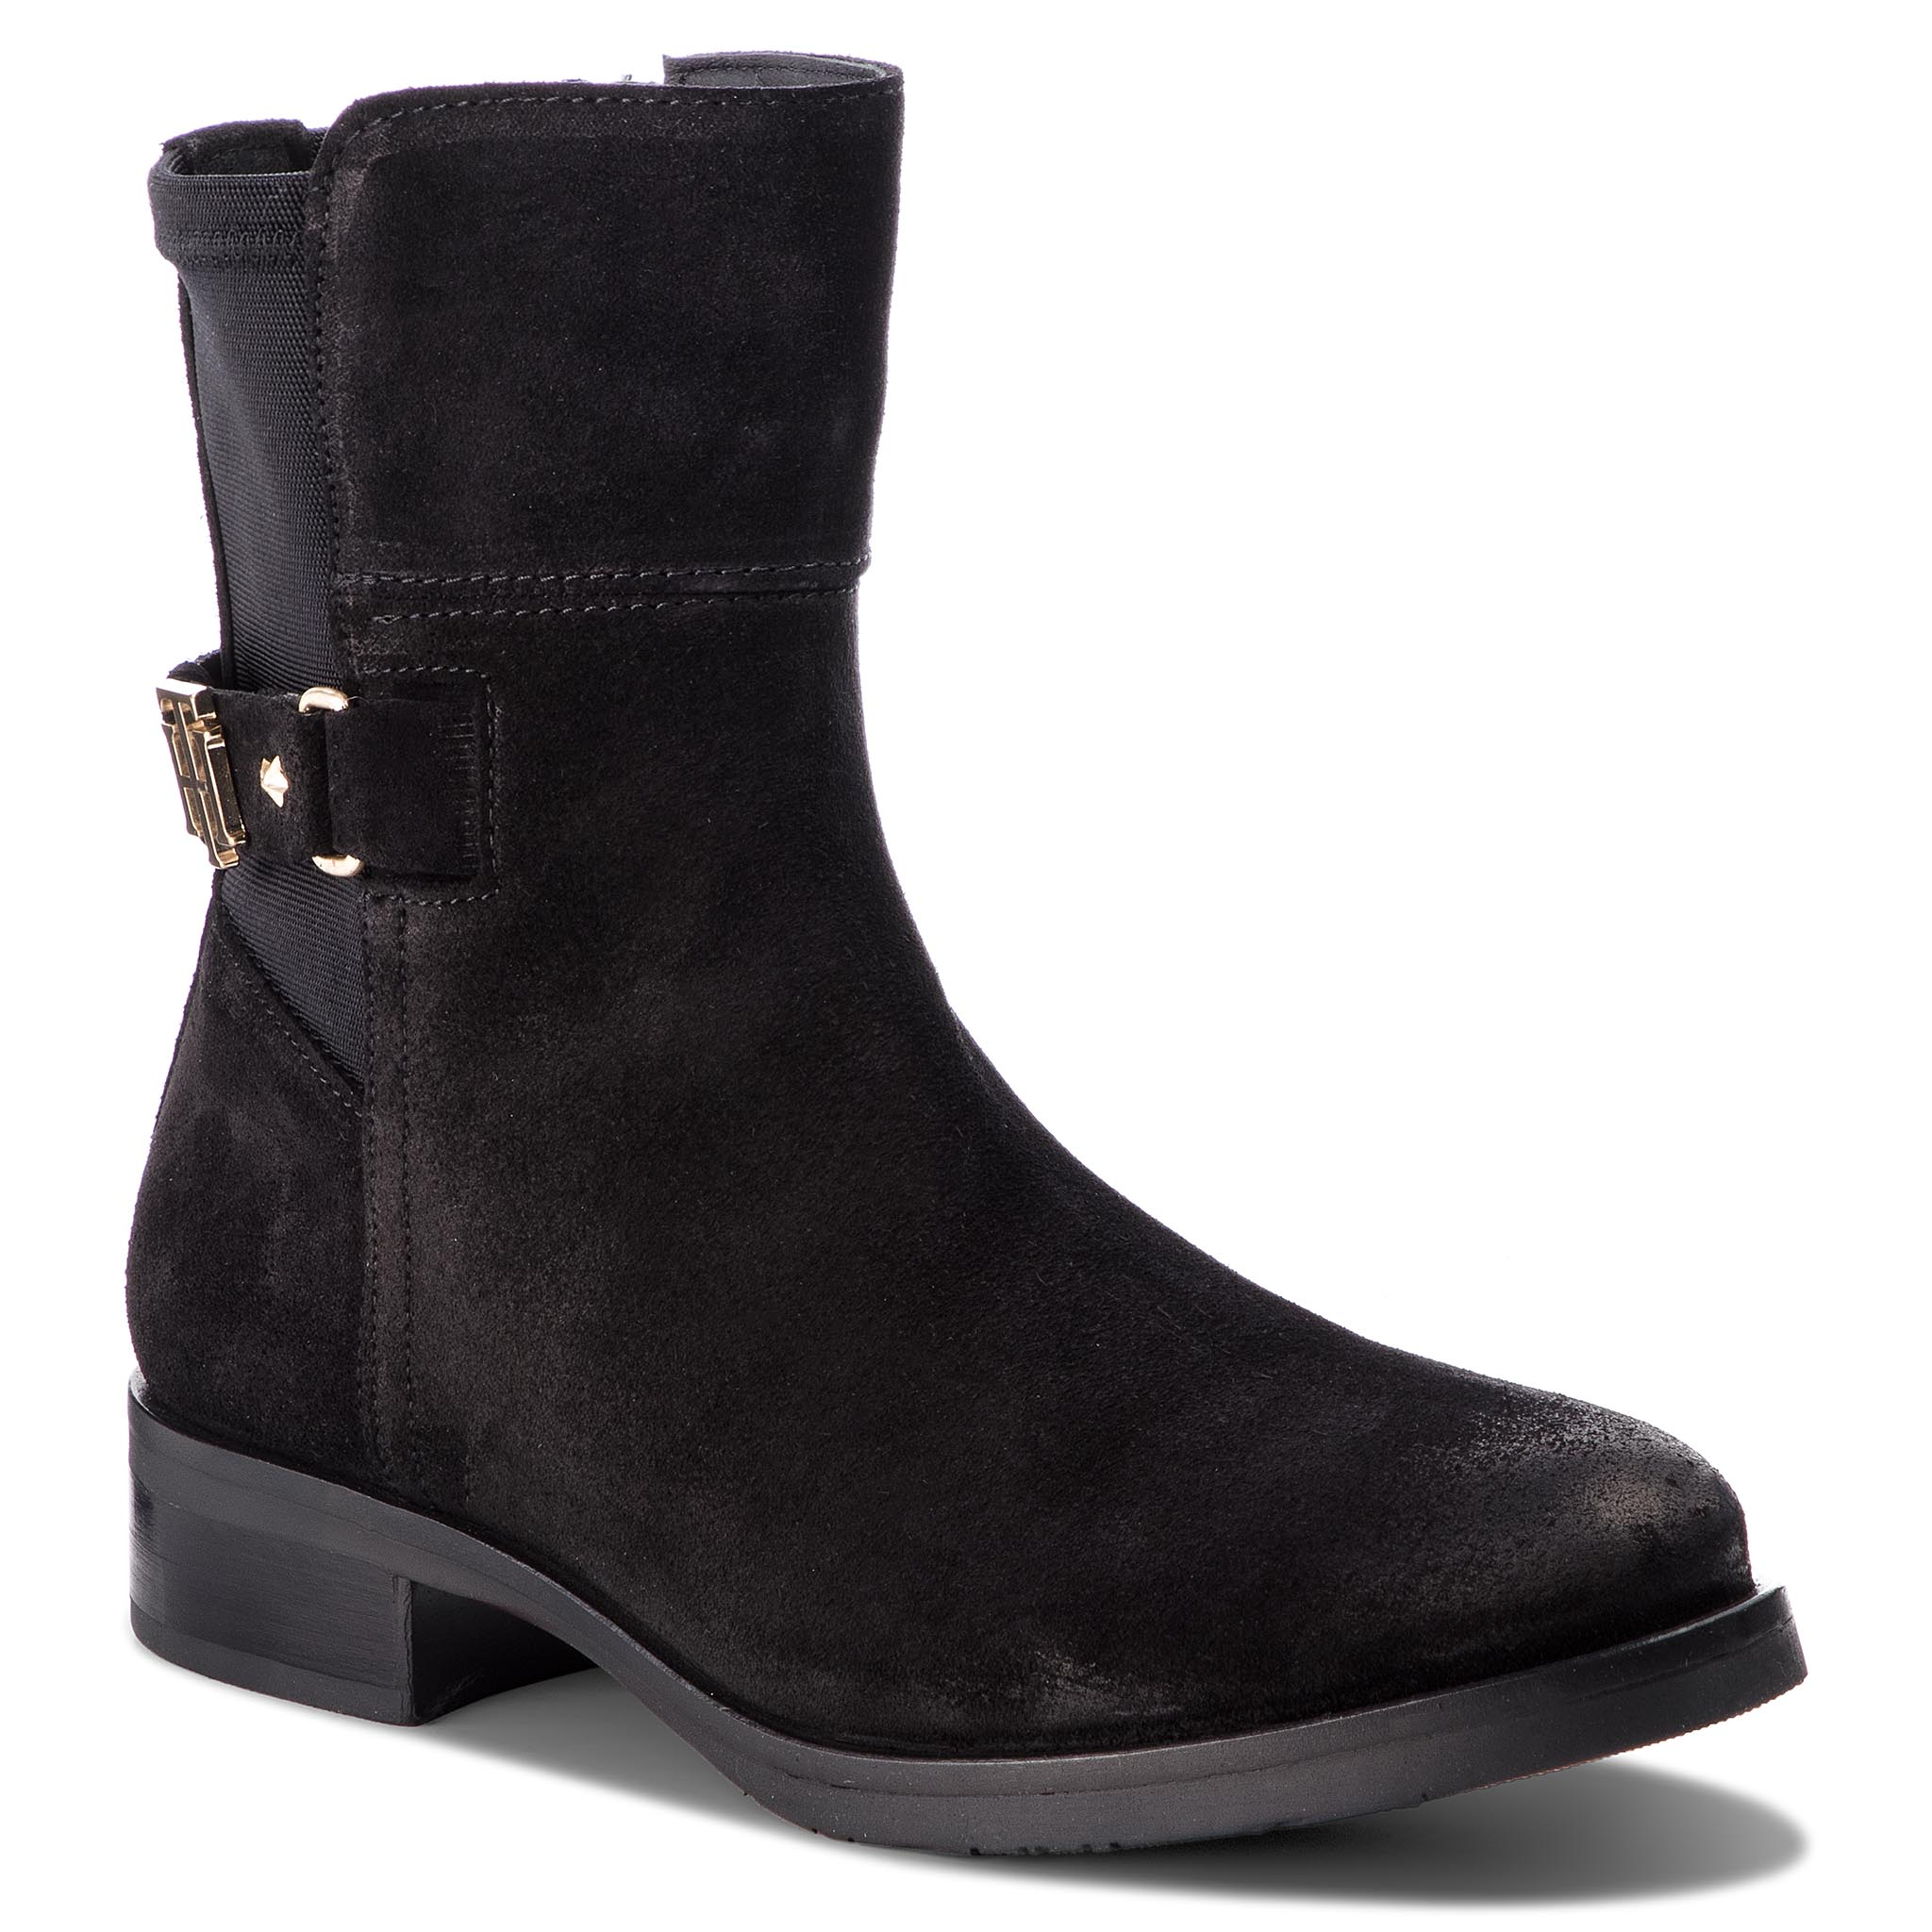 c3f125076af8 Boots TOMMY HILFIGER Th Buckle Bootie Str FW0FW03066 Black 990